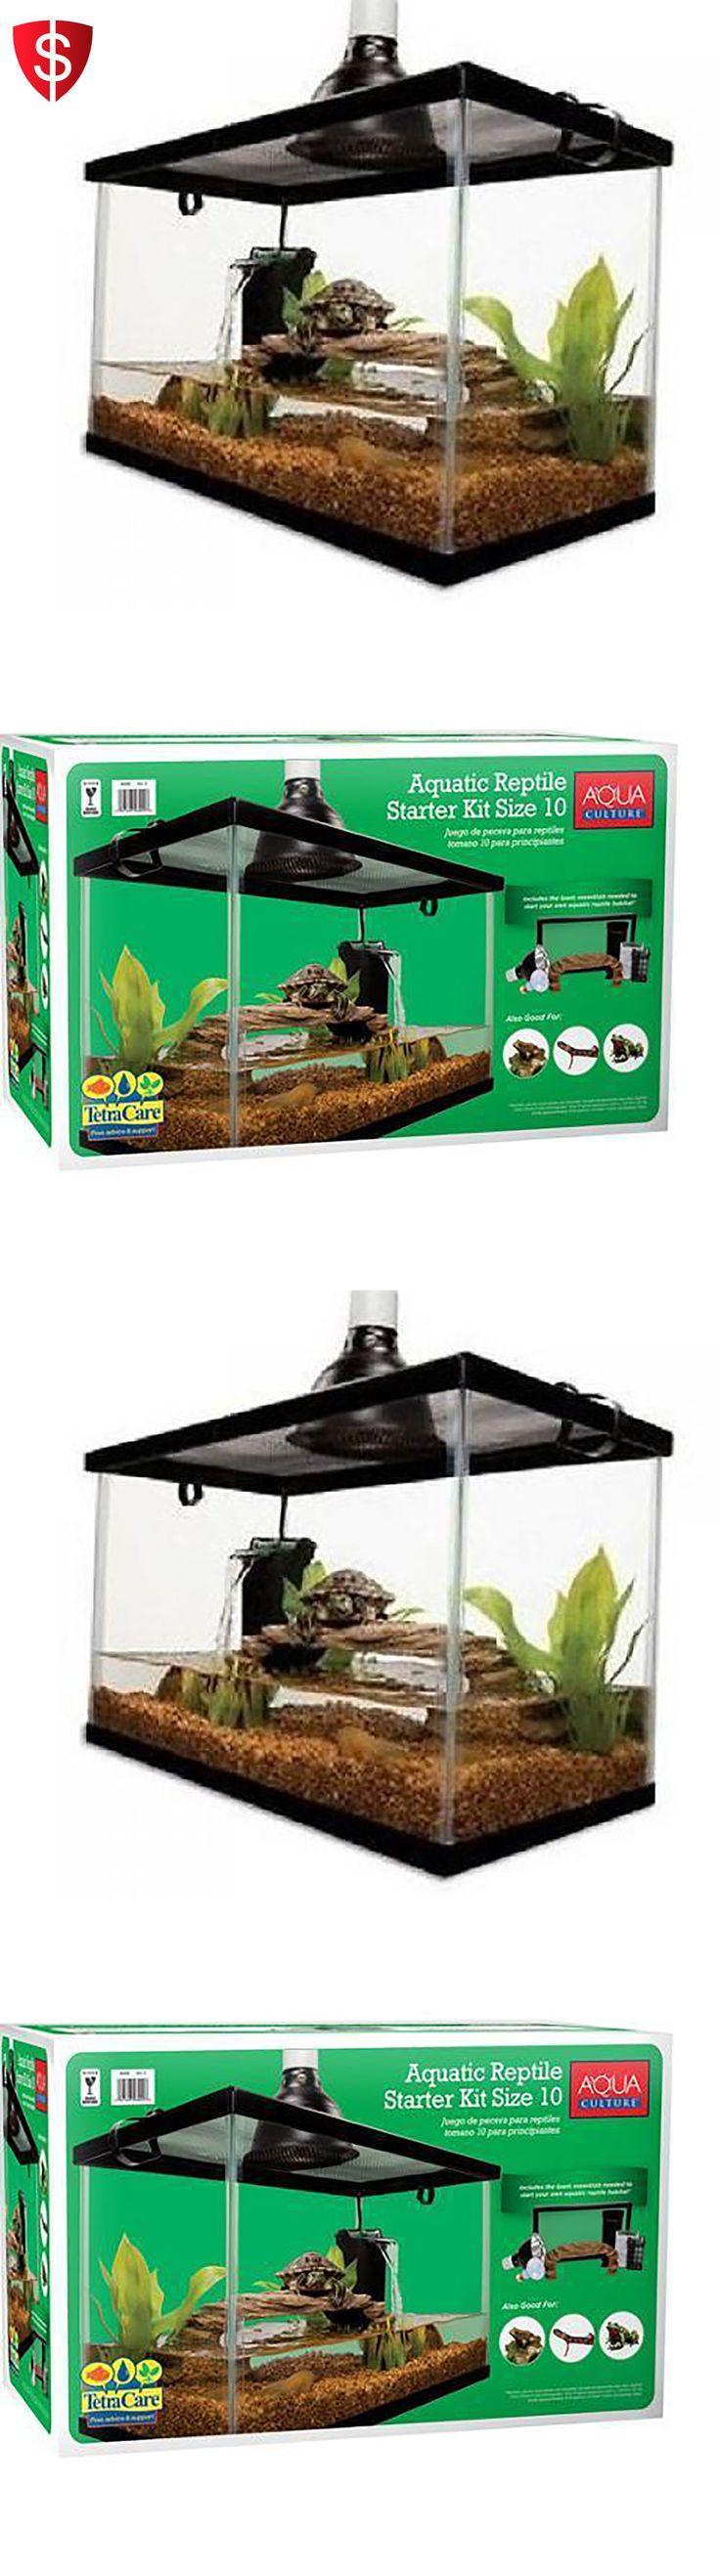 Reptile Supplies 1285: 10 Gallon Aquarium Tank Kit Reptile Turtle Frog Lizard Snake Exo Animal Habitat -> BUY IT NOW ONLY: $65.5 on eBay!